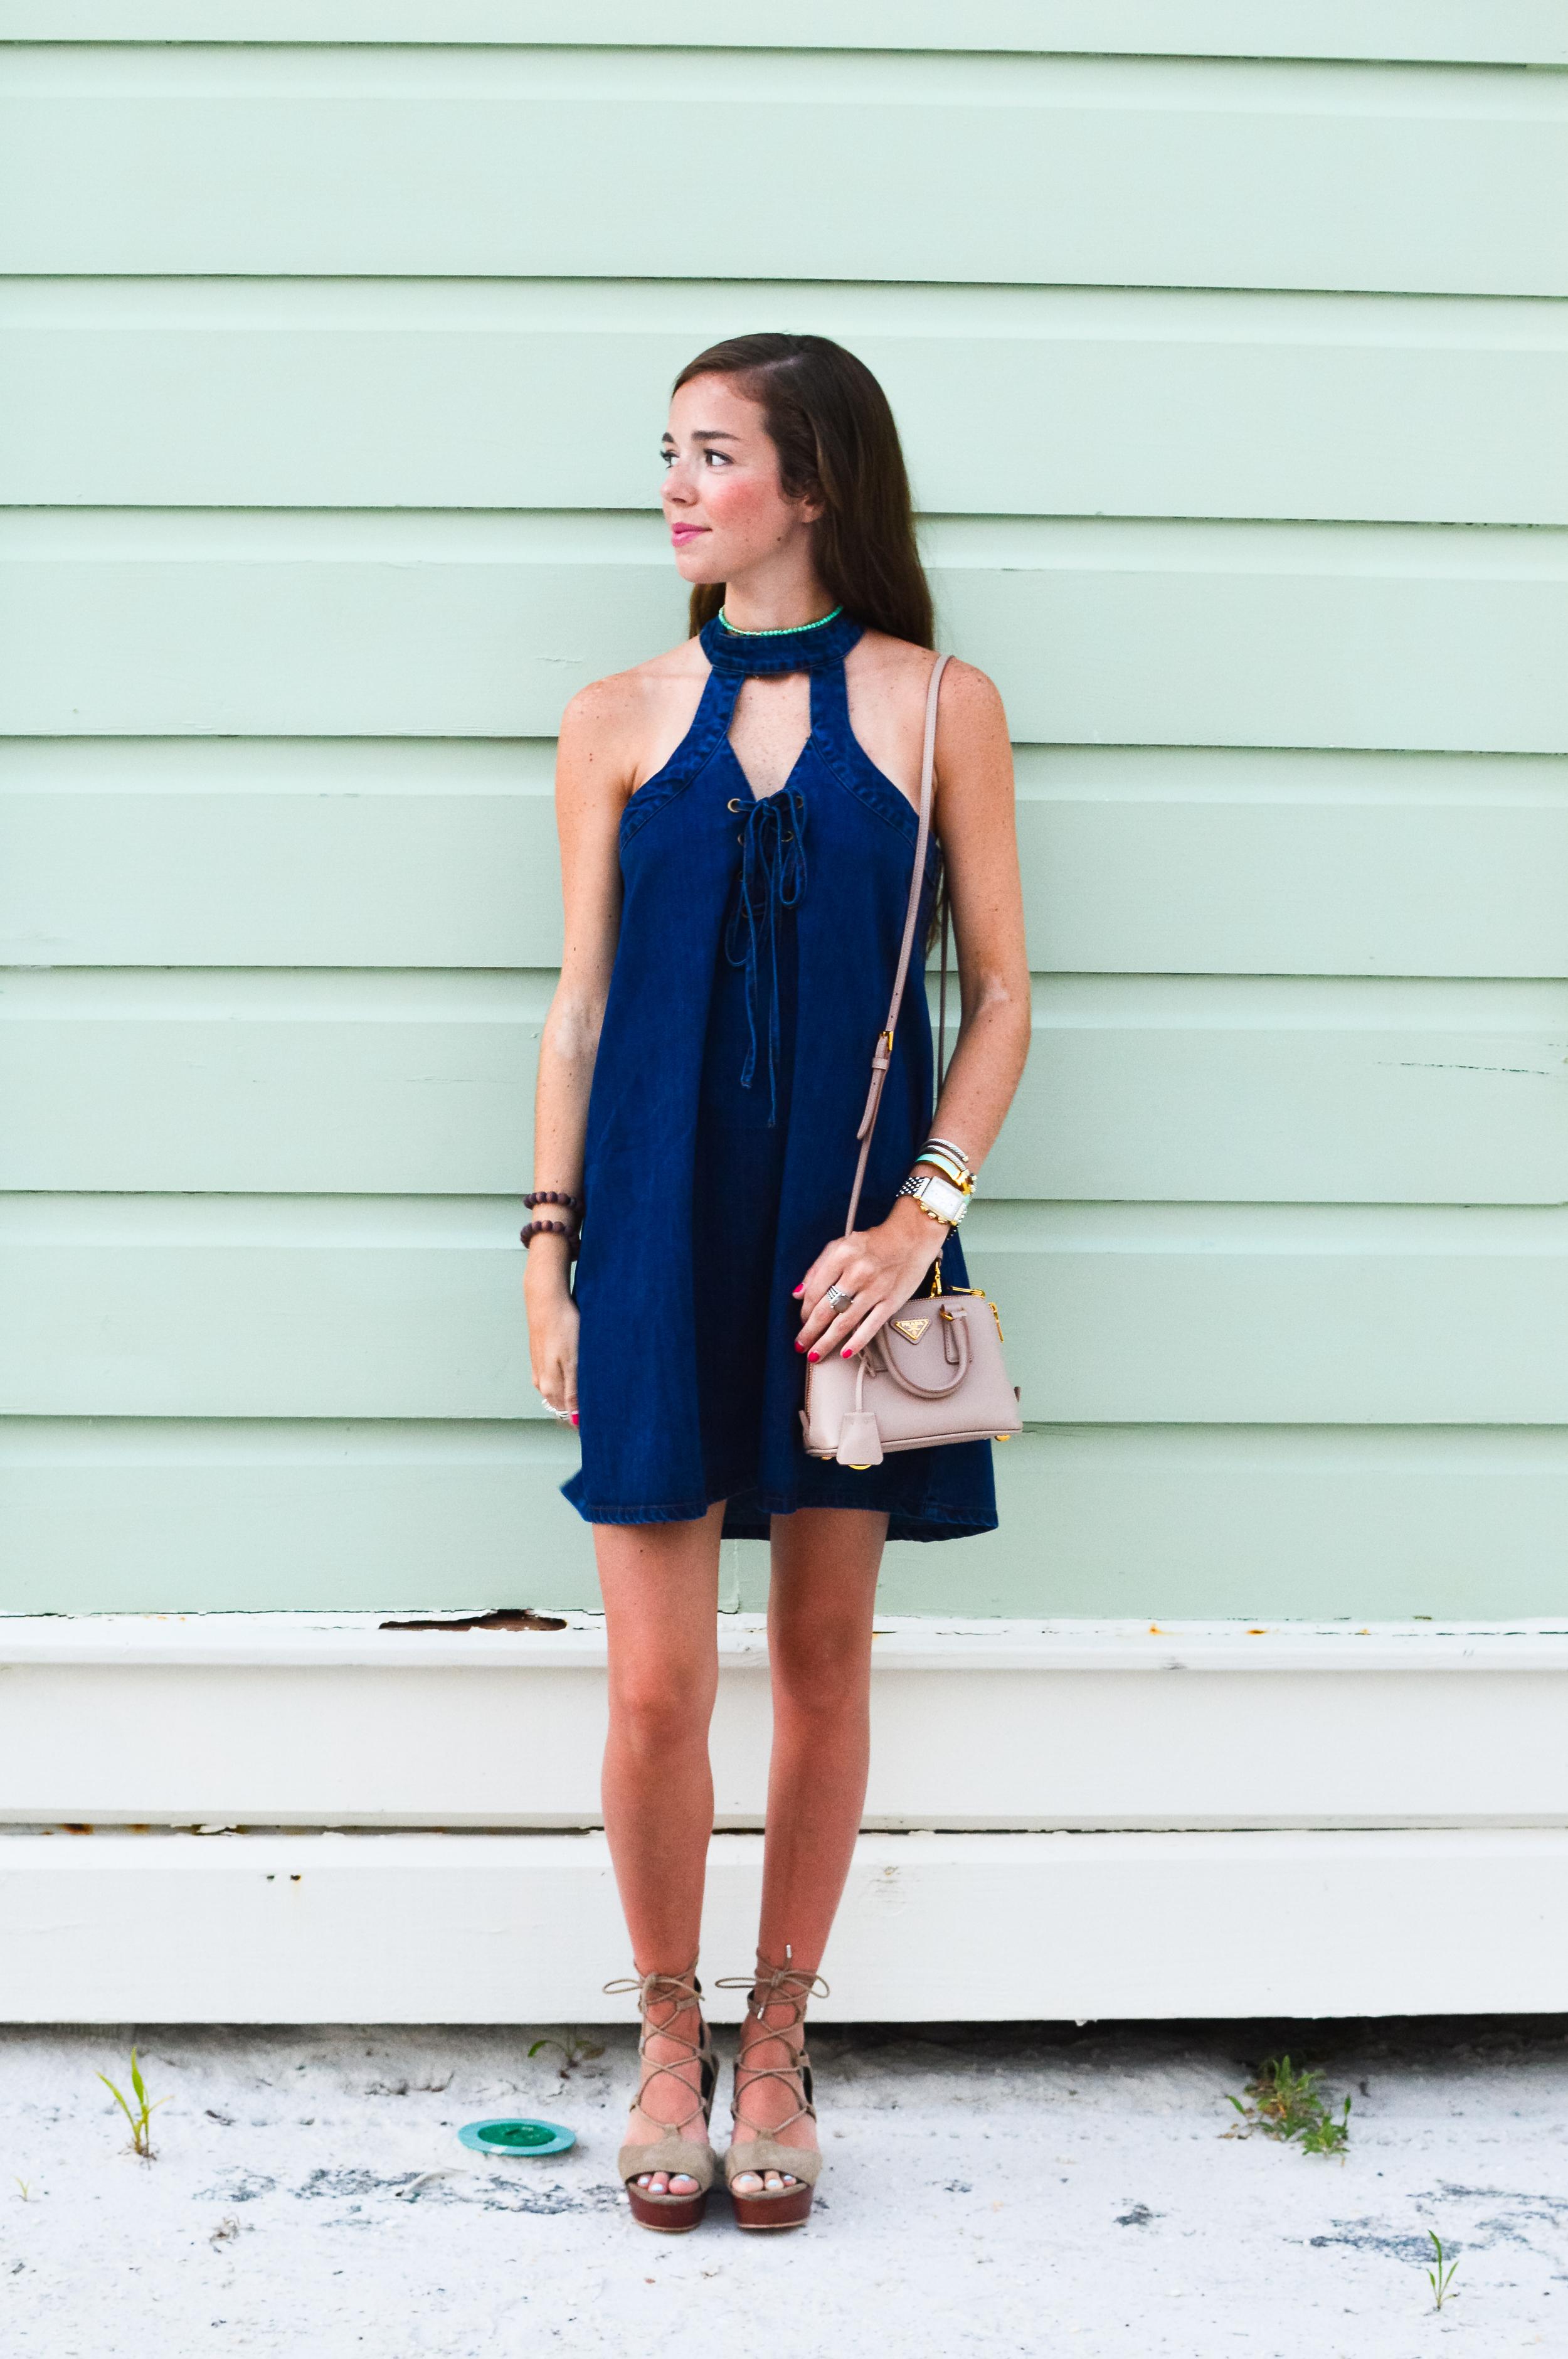 fashion blogger lcb style blue dress (9 of 14).jpg